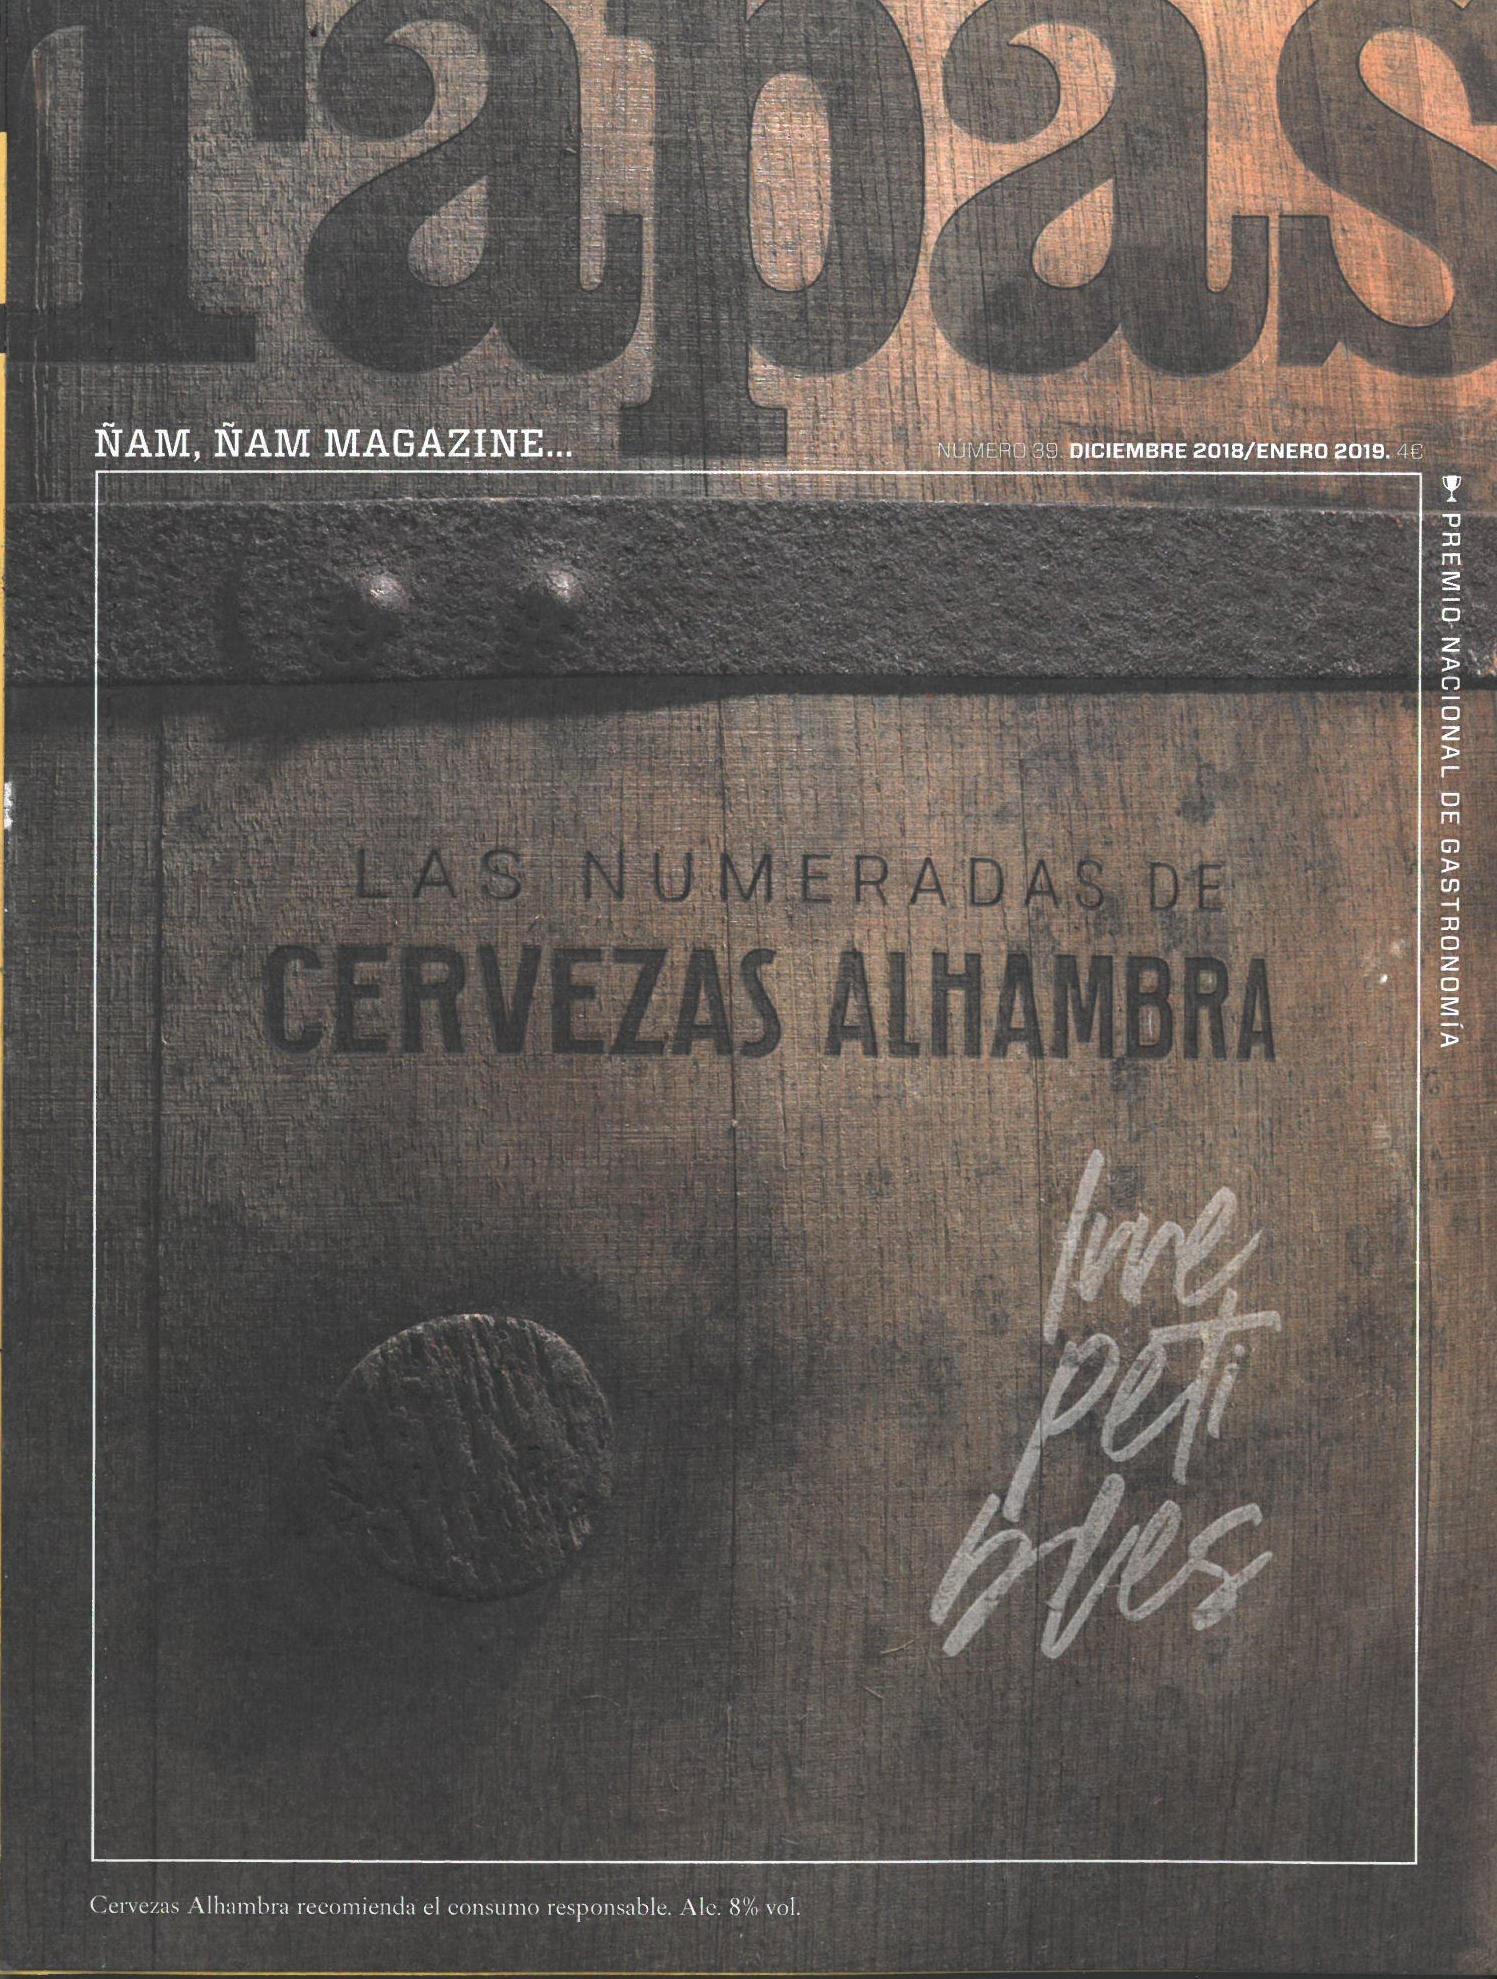 SPAIN_TAPAS_Diciembre2018_Enero_2019_Cover.jpg